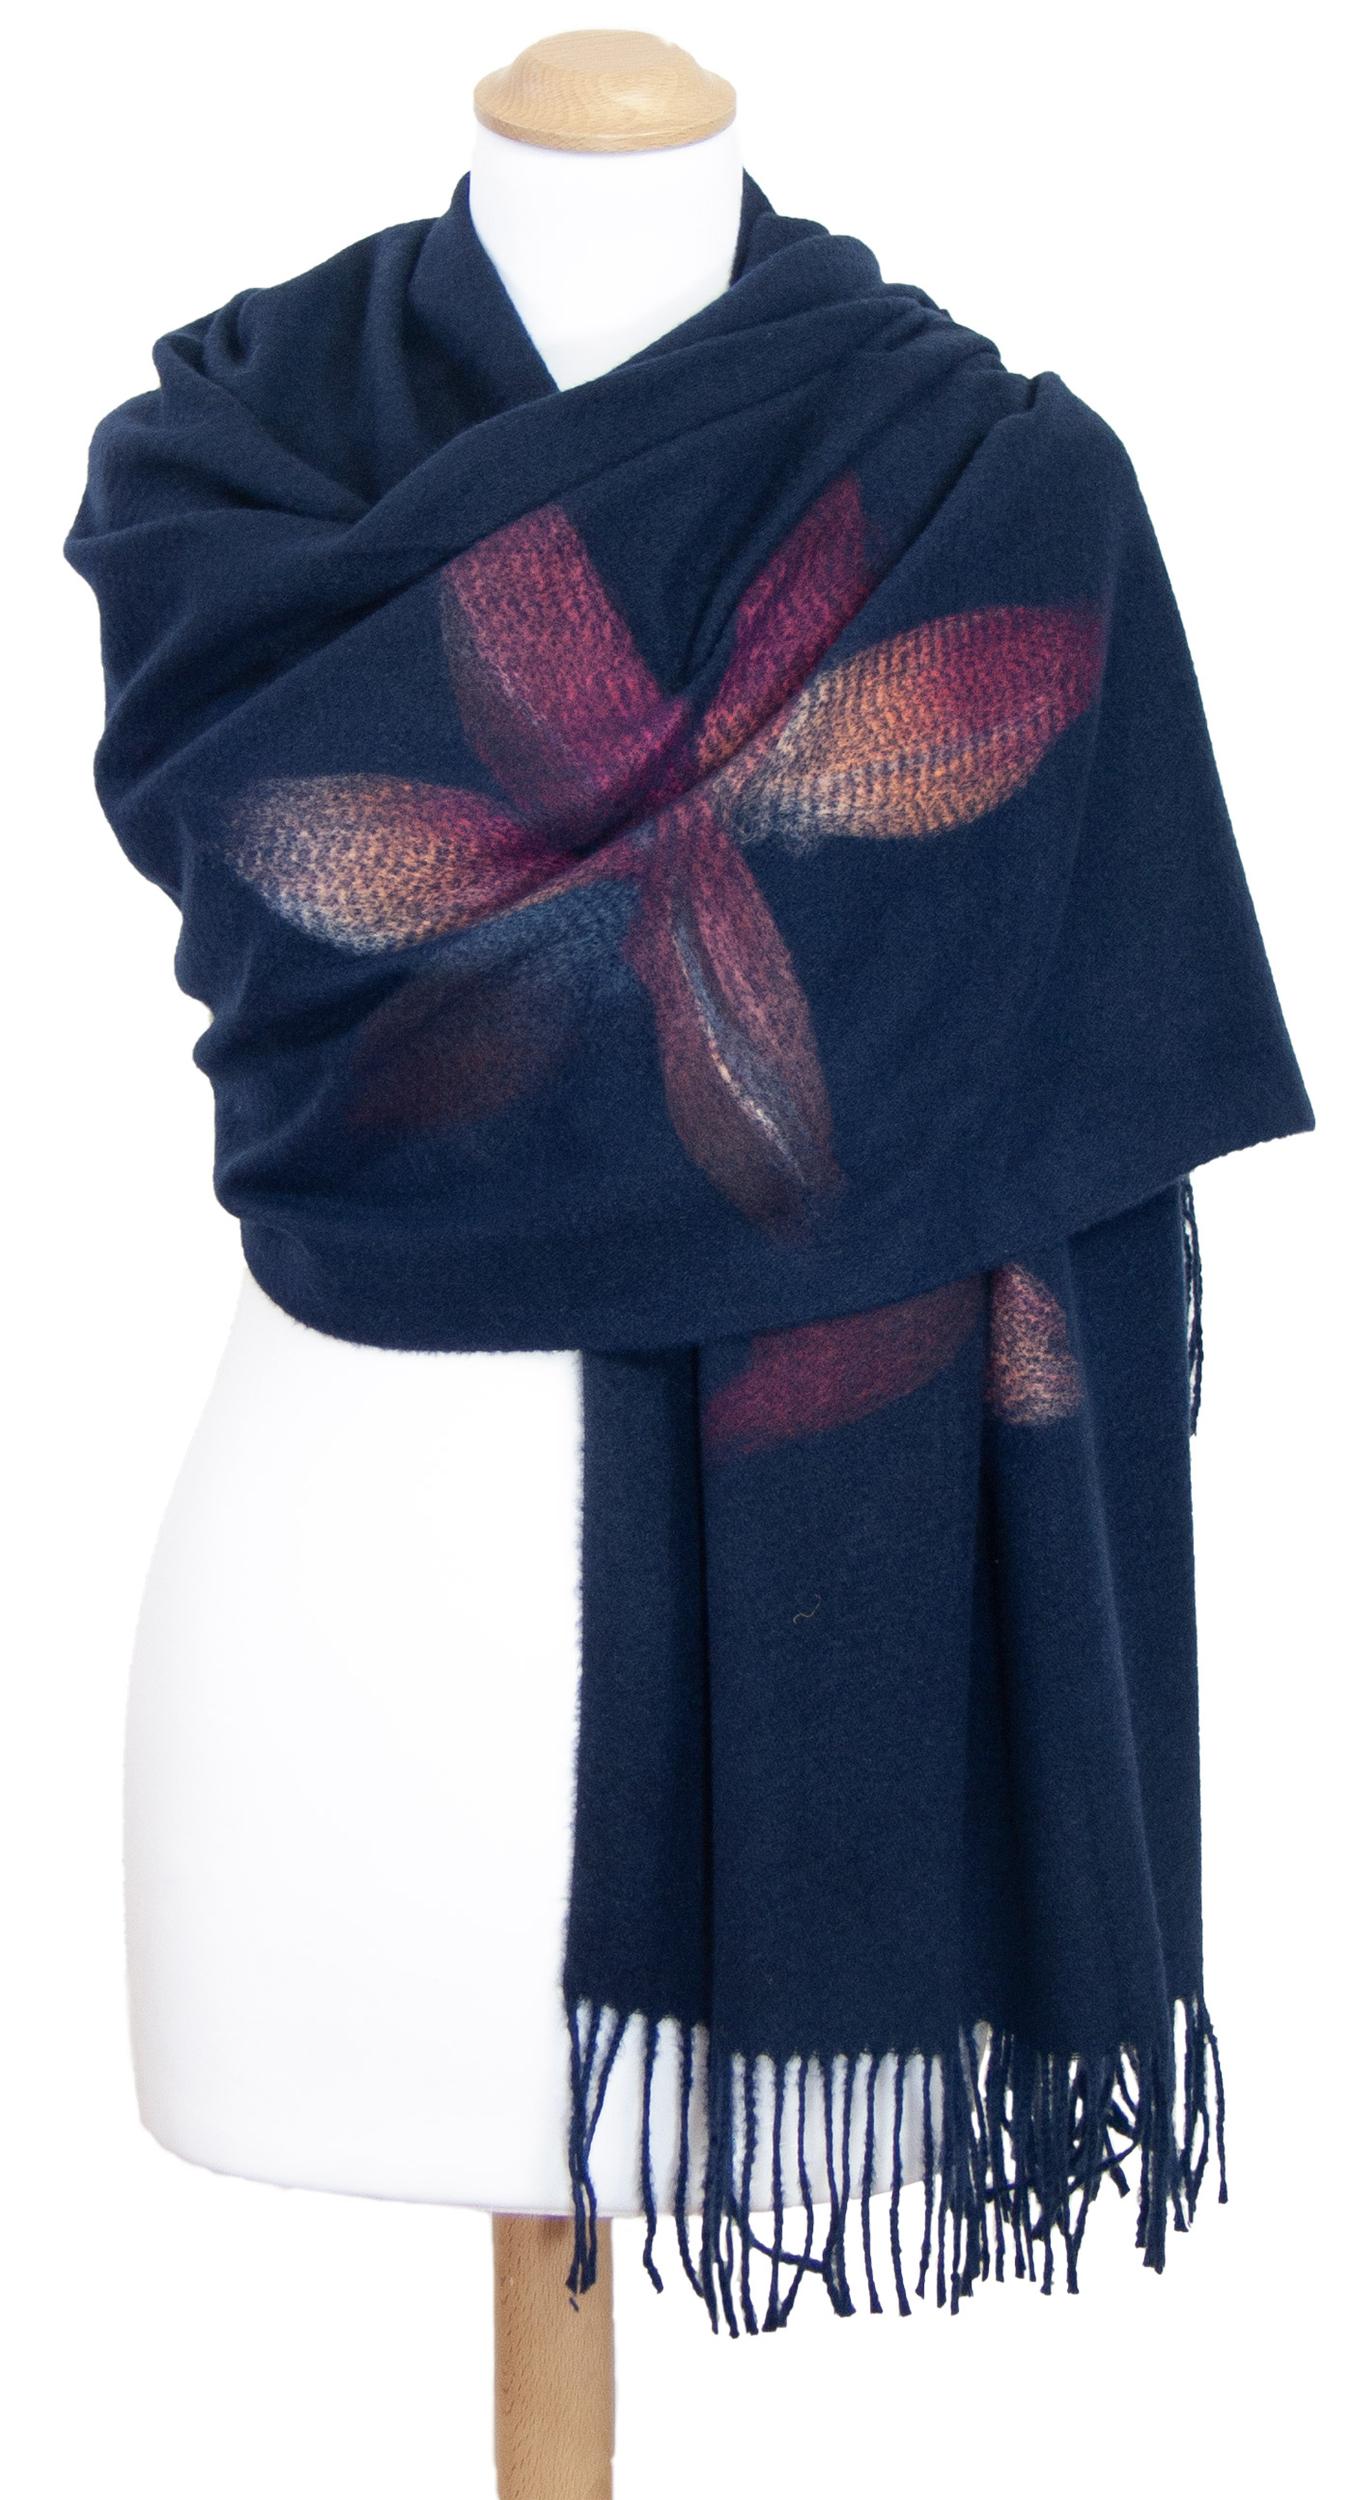 Châle bleu marine laine fleurs Eva